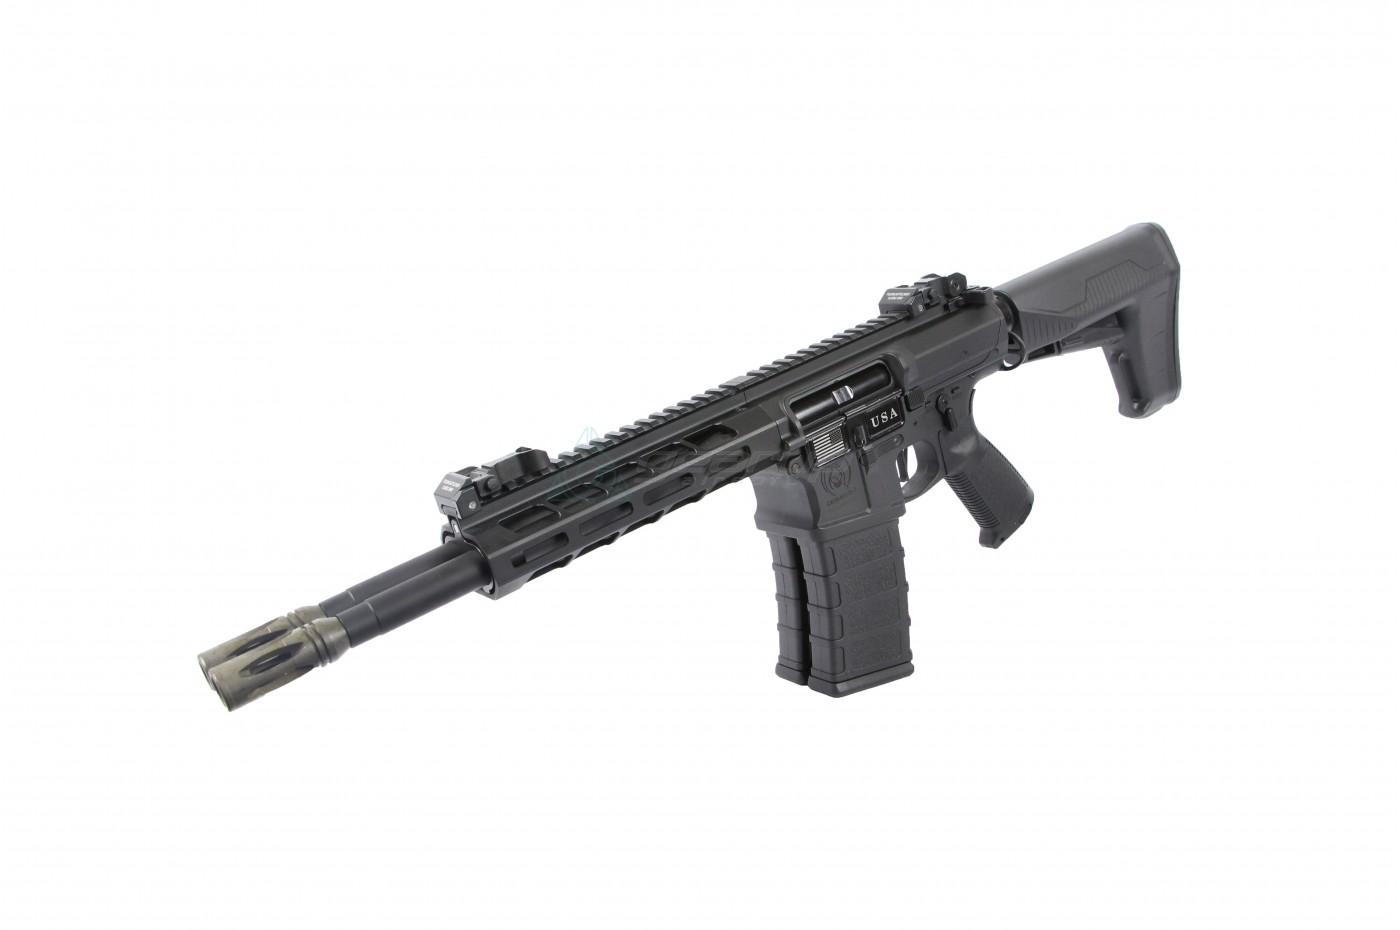 Airsoft 5KU Metal Outer Barrel Carbine Length 290mm For M4 M16 M-Series AEG